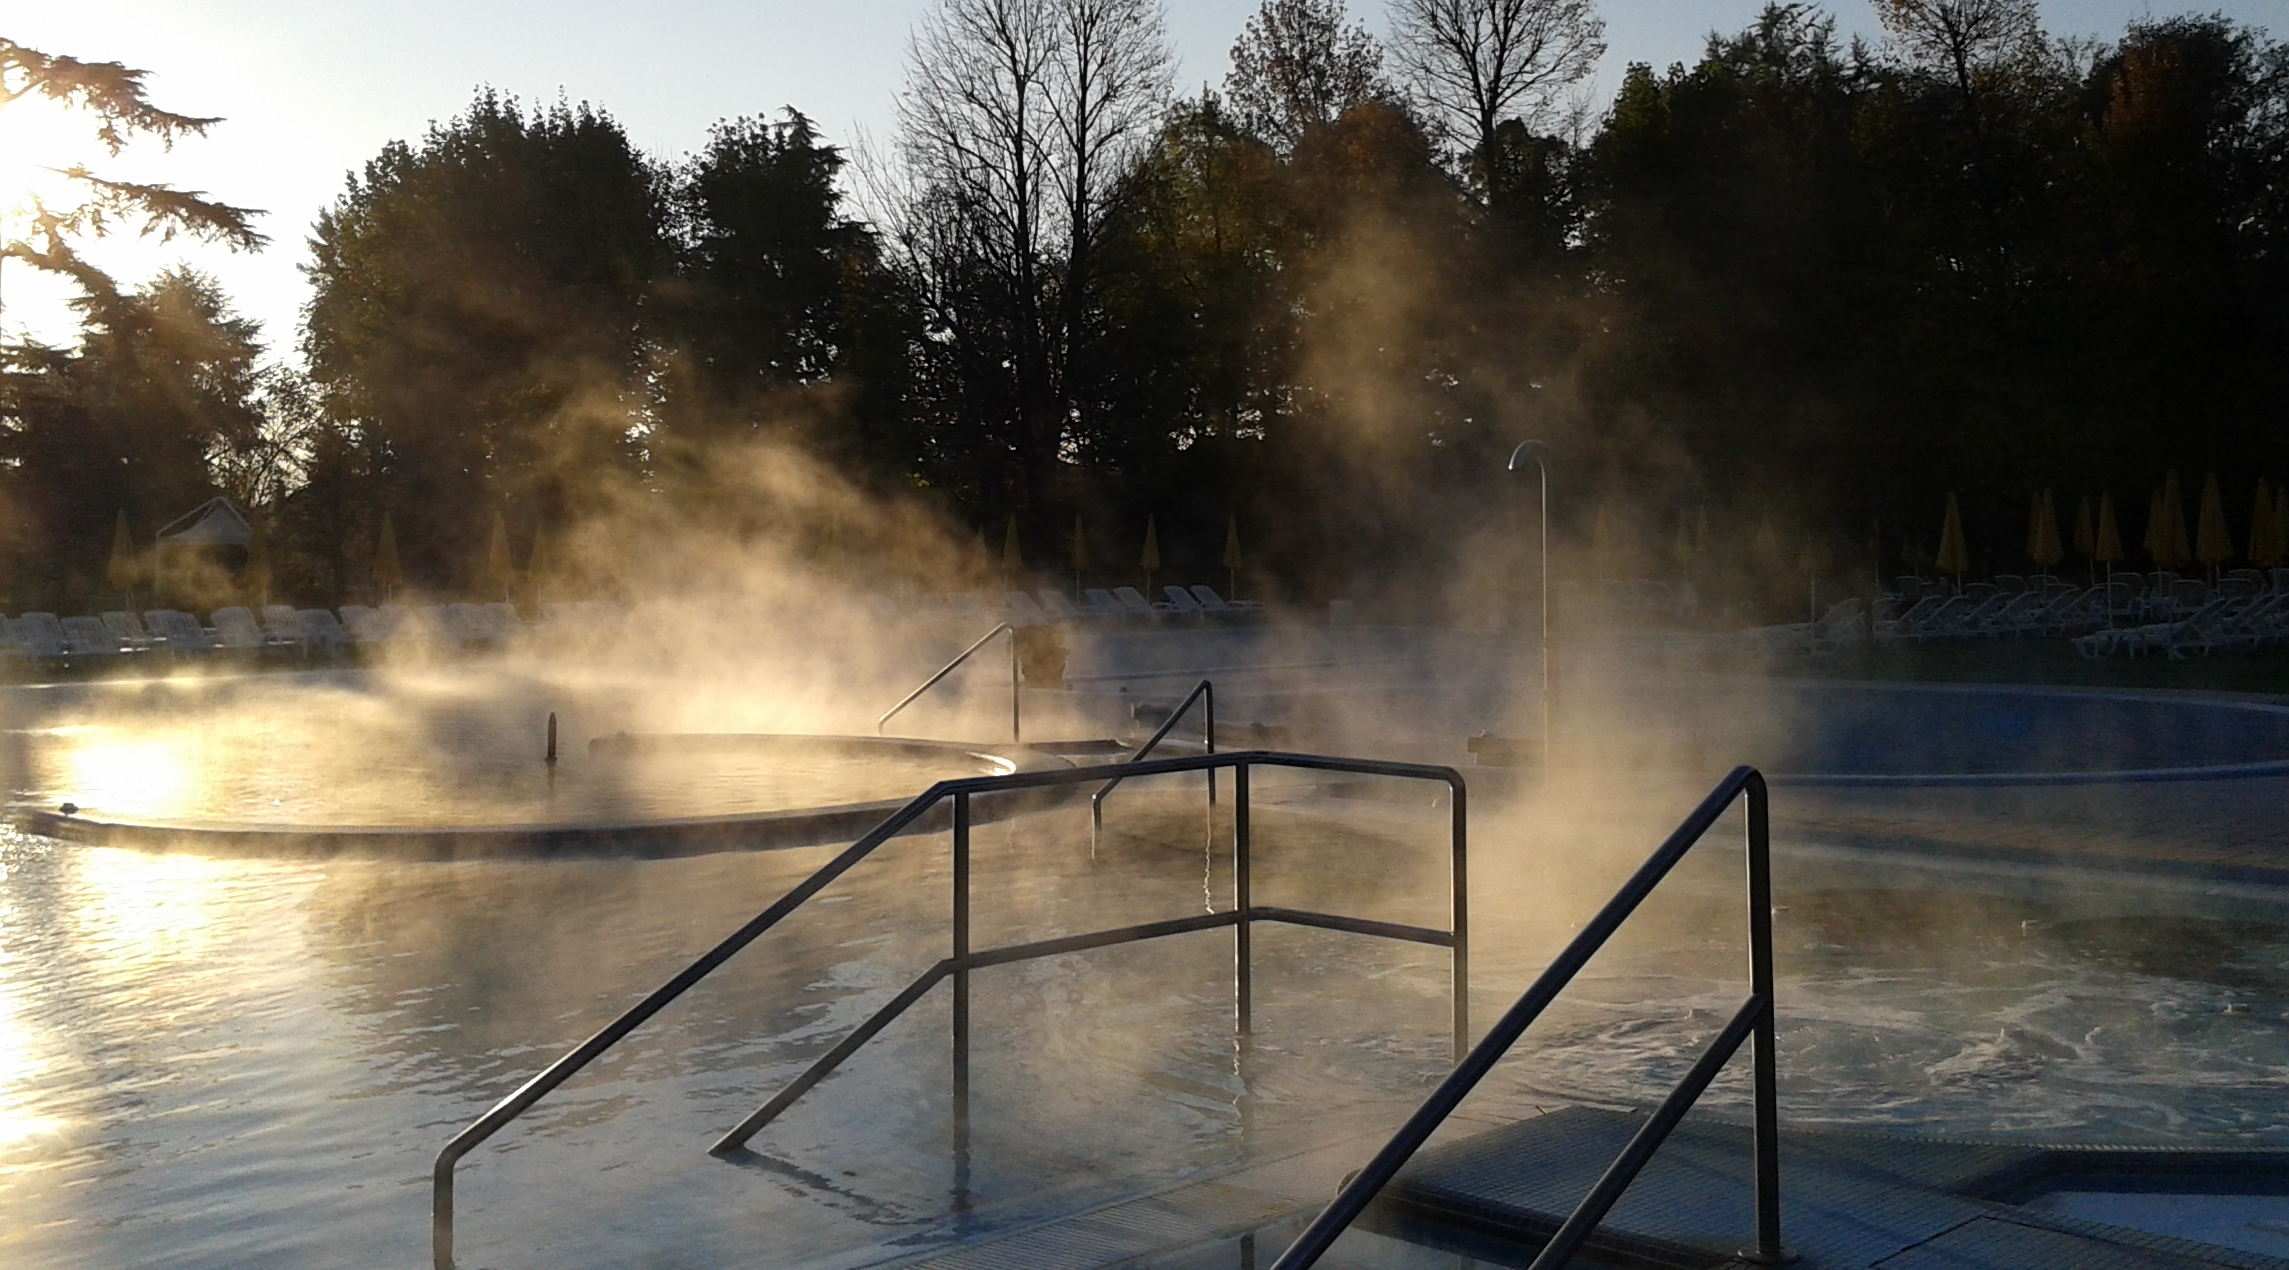 Piscine termali thermae abano montegrotto for Abano terme piscine